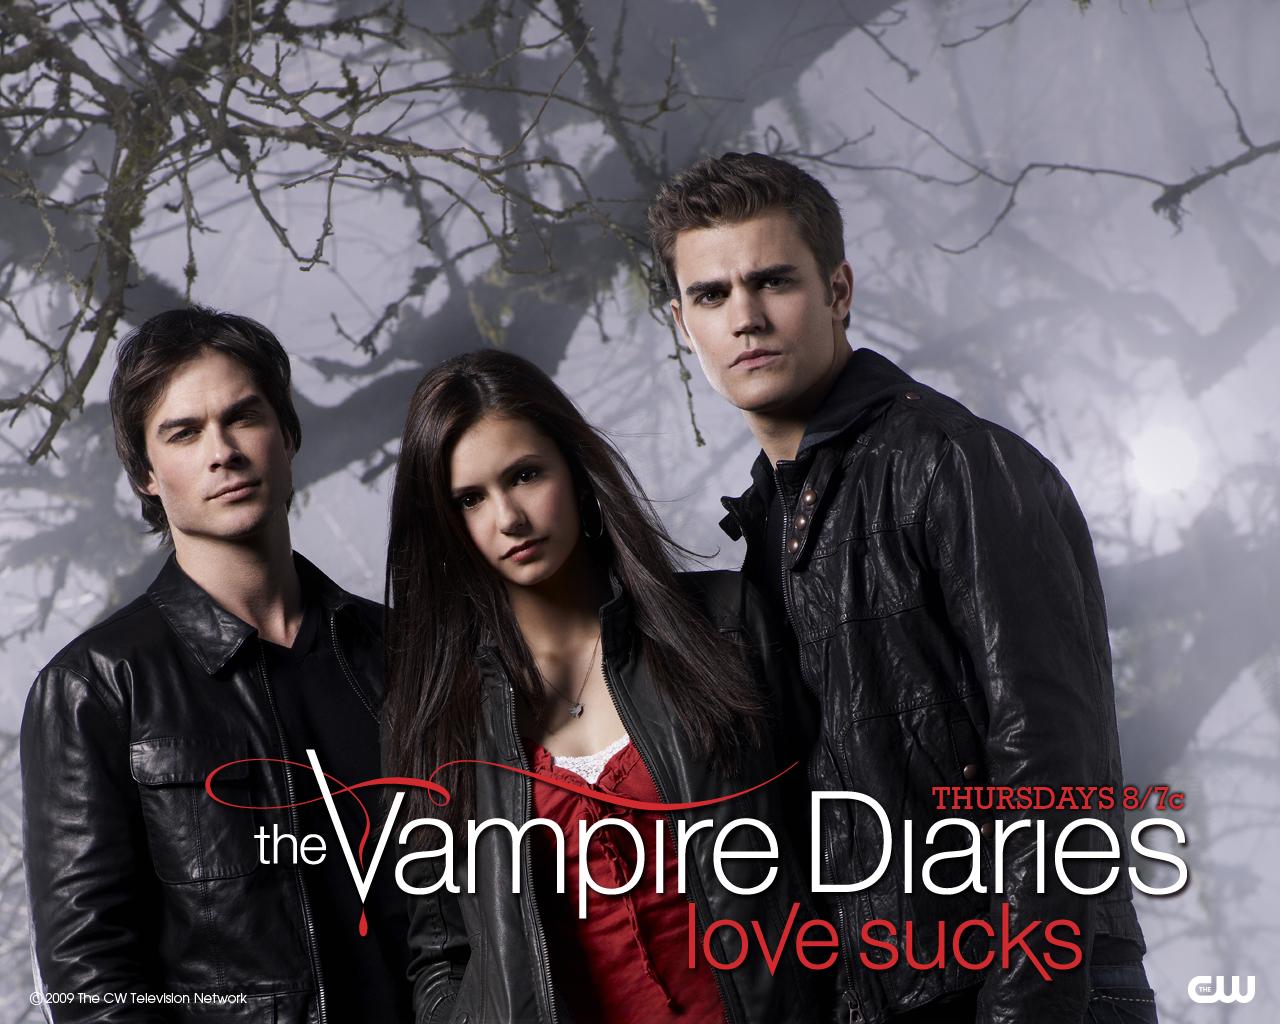 The Vampire Diaries Blm Rehberi Tantm Wallpaper Kadro 1280x1024